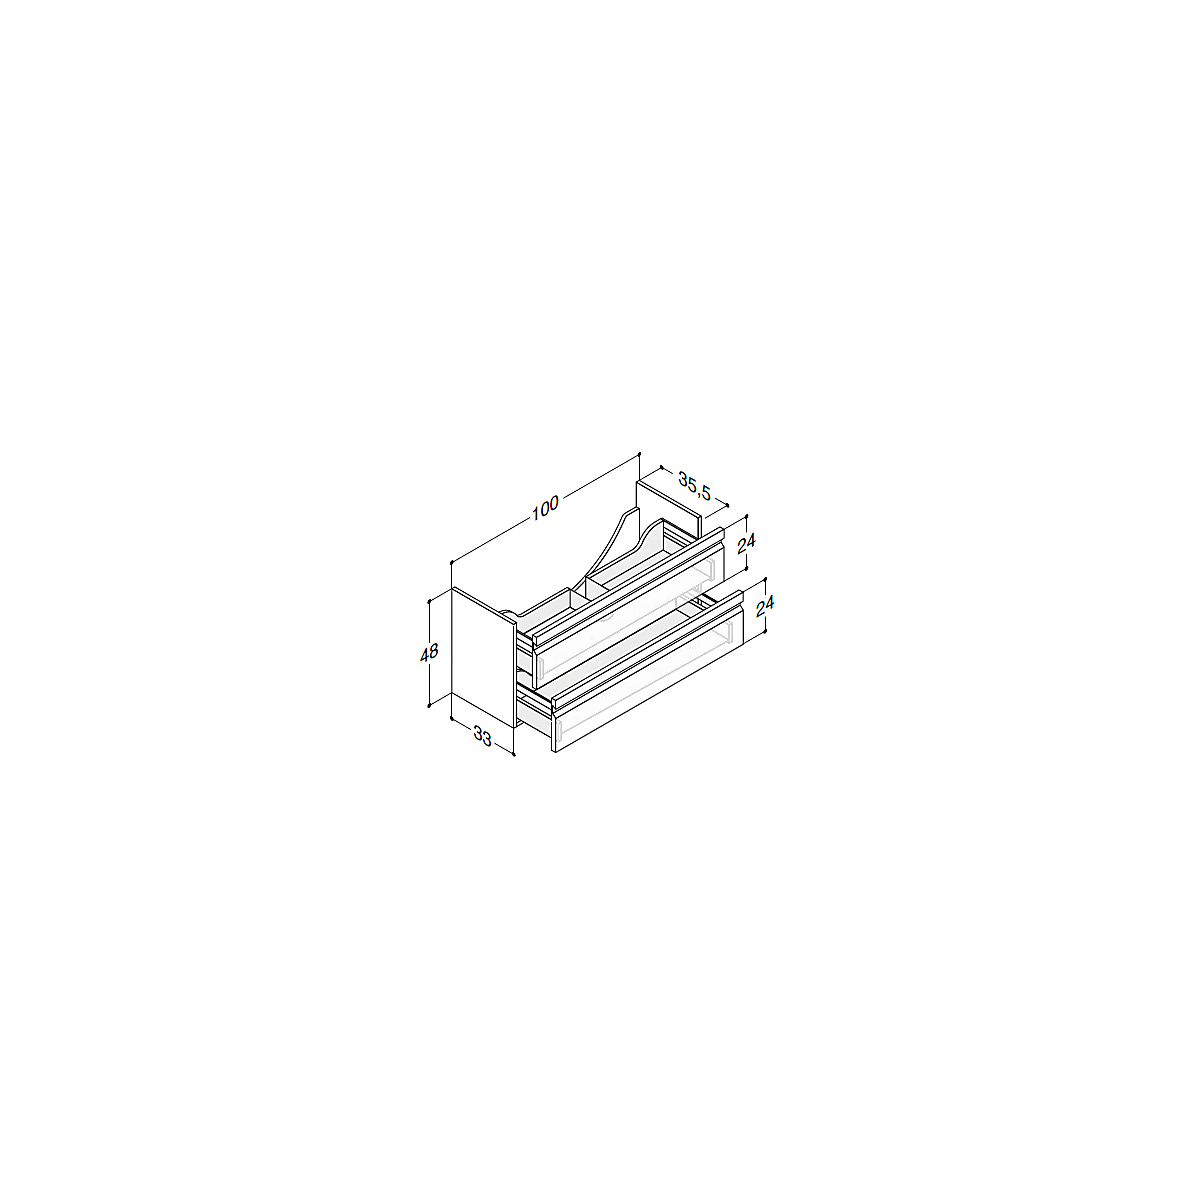 K40122LE   Dansani Zaro Tvättställskåp m/2 lådor 1000x350 mm, Svart Gummi, m/ LED